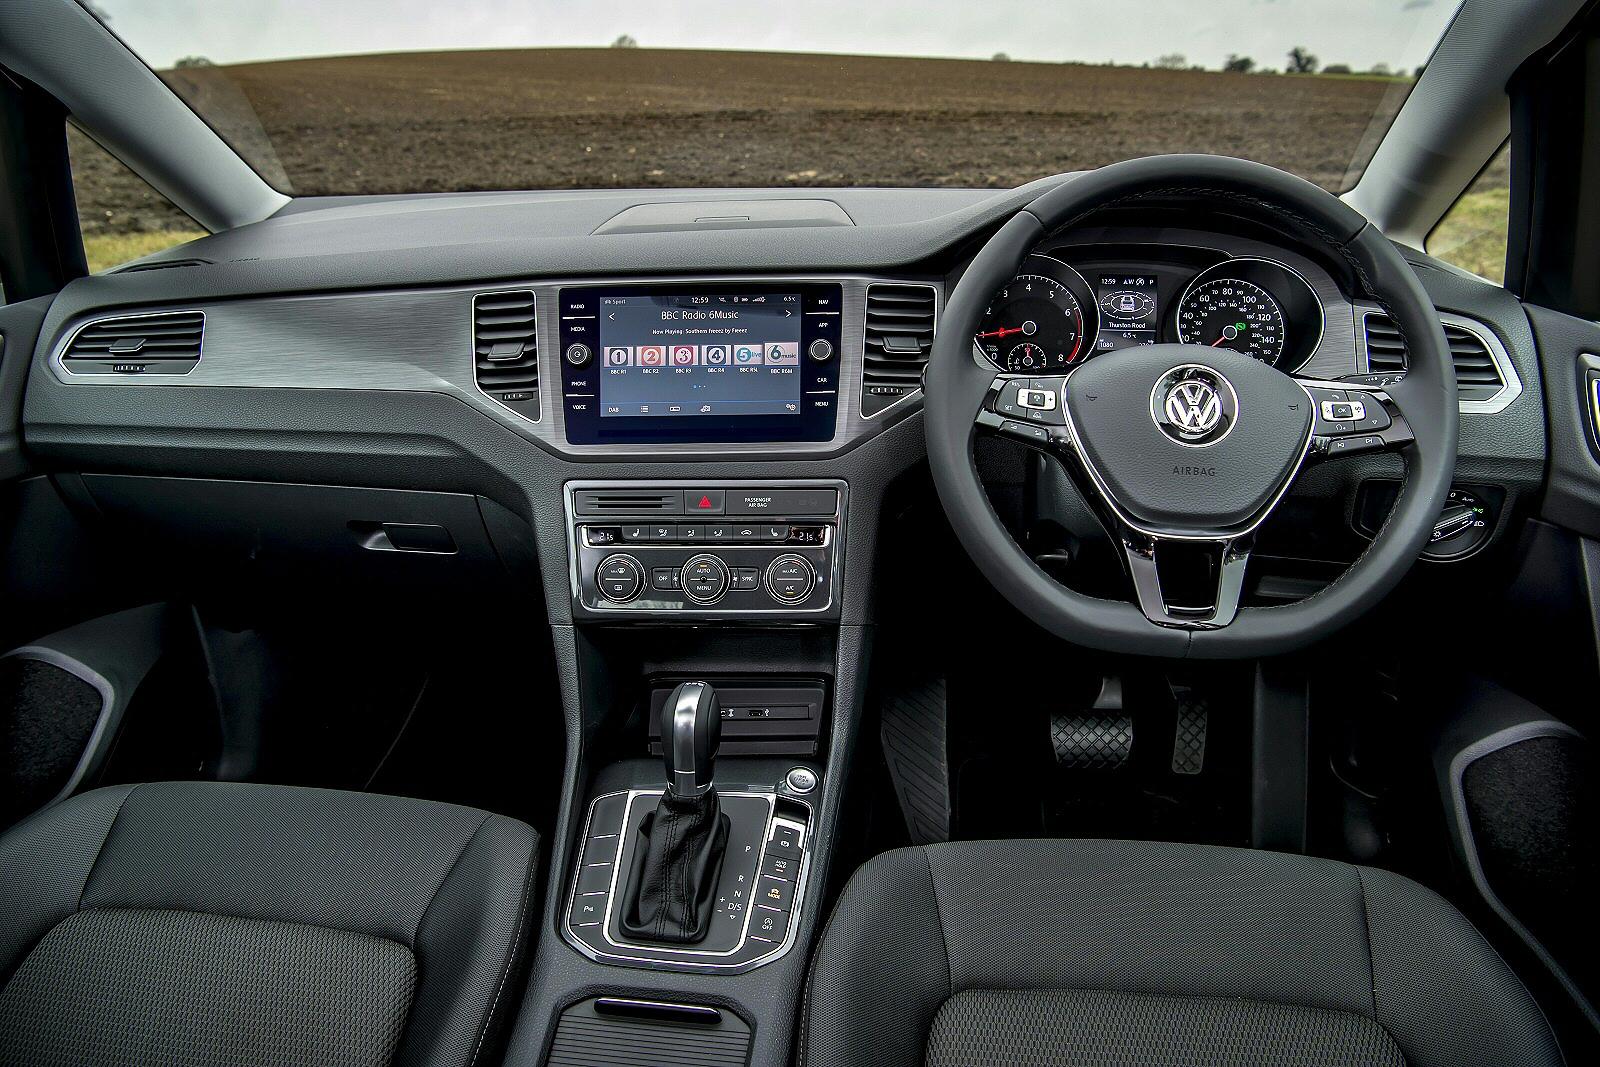 Volkswagen GOLF SV 1.5 TSI EVO 150 Match 5dr DSG